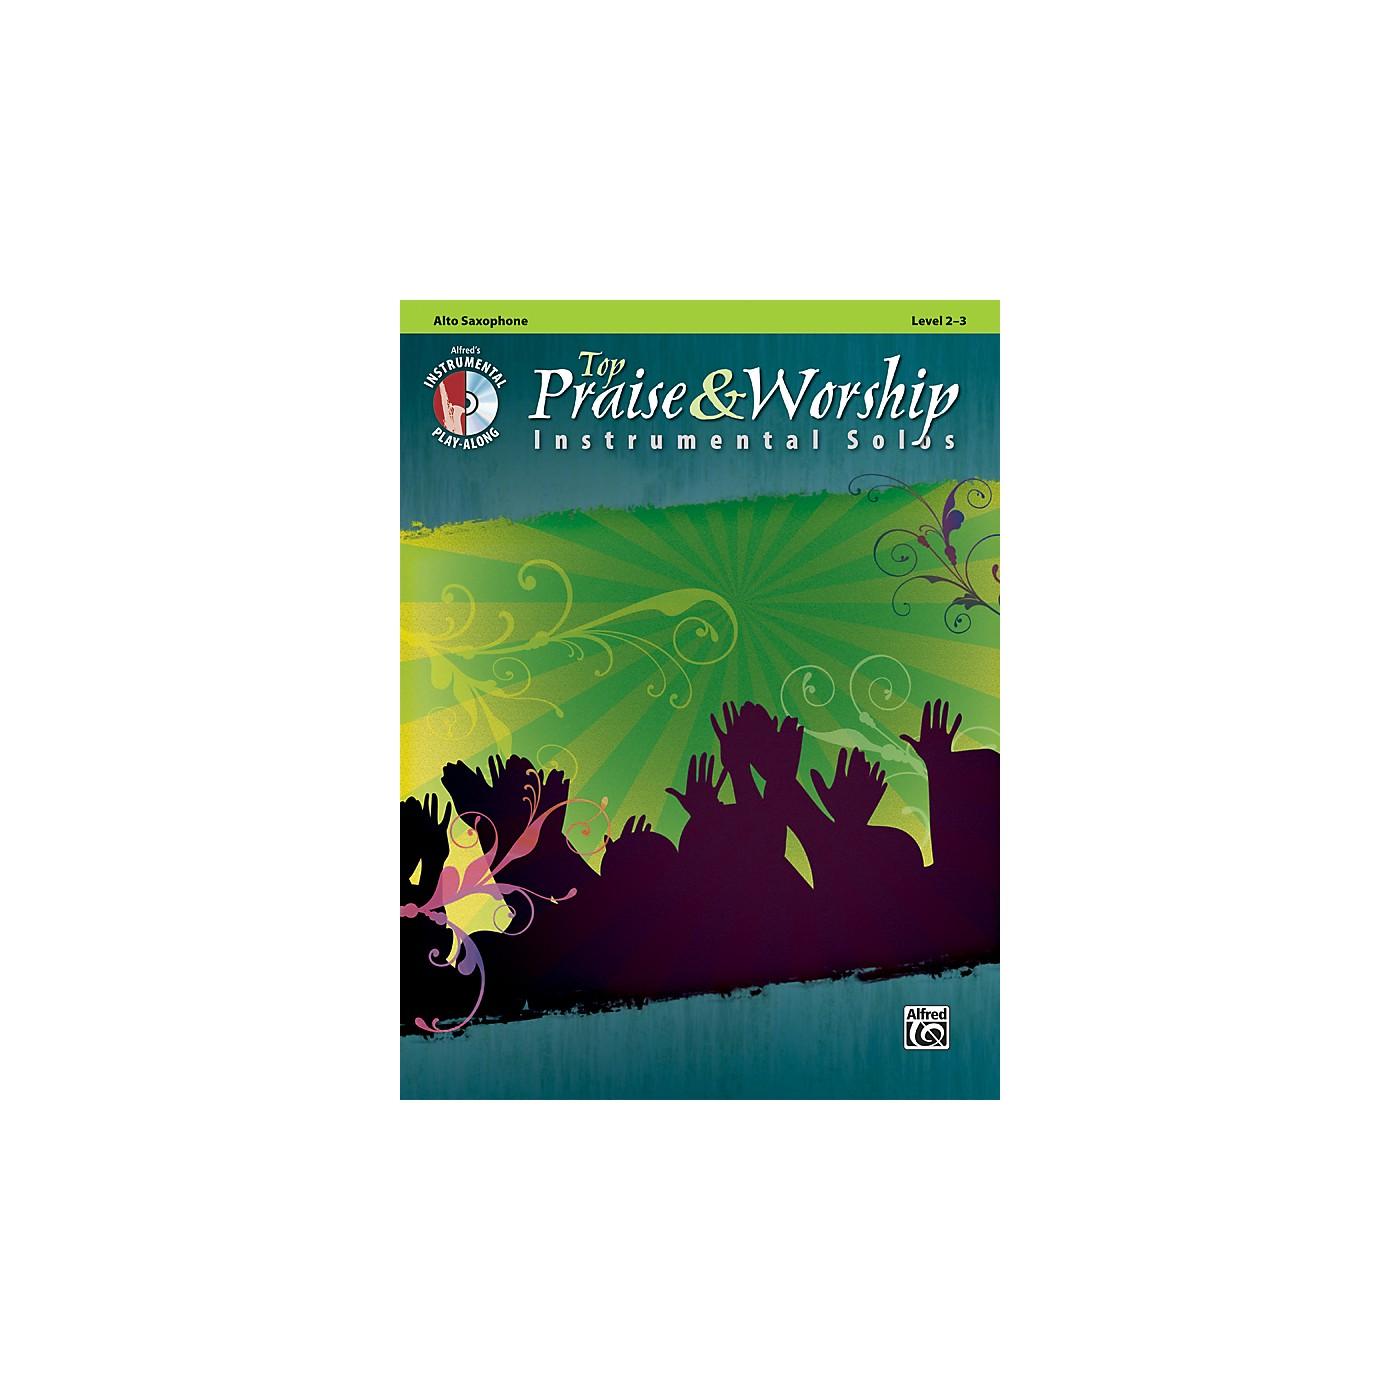 Alfred Top Praise & Worship Instrumental Solos - Alto Sax, Level 2-3 (Book/CD) thumbnail